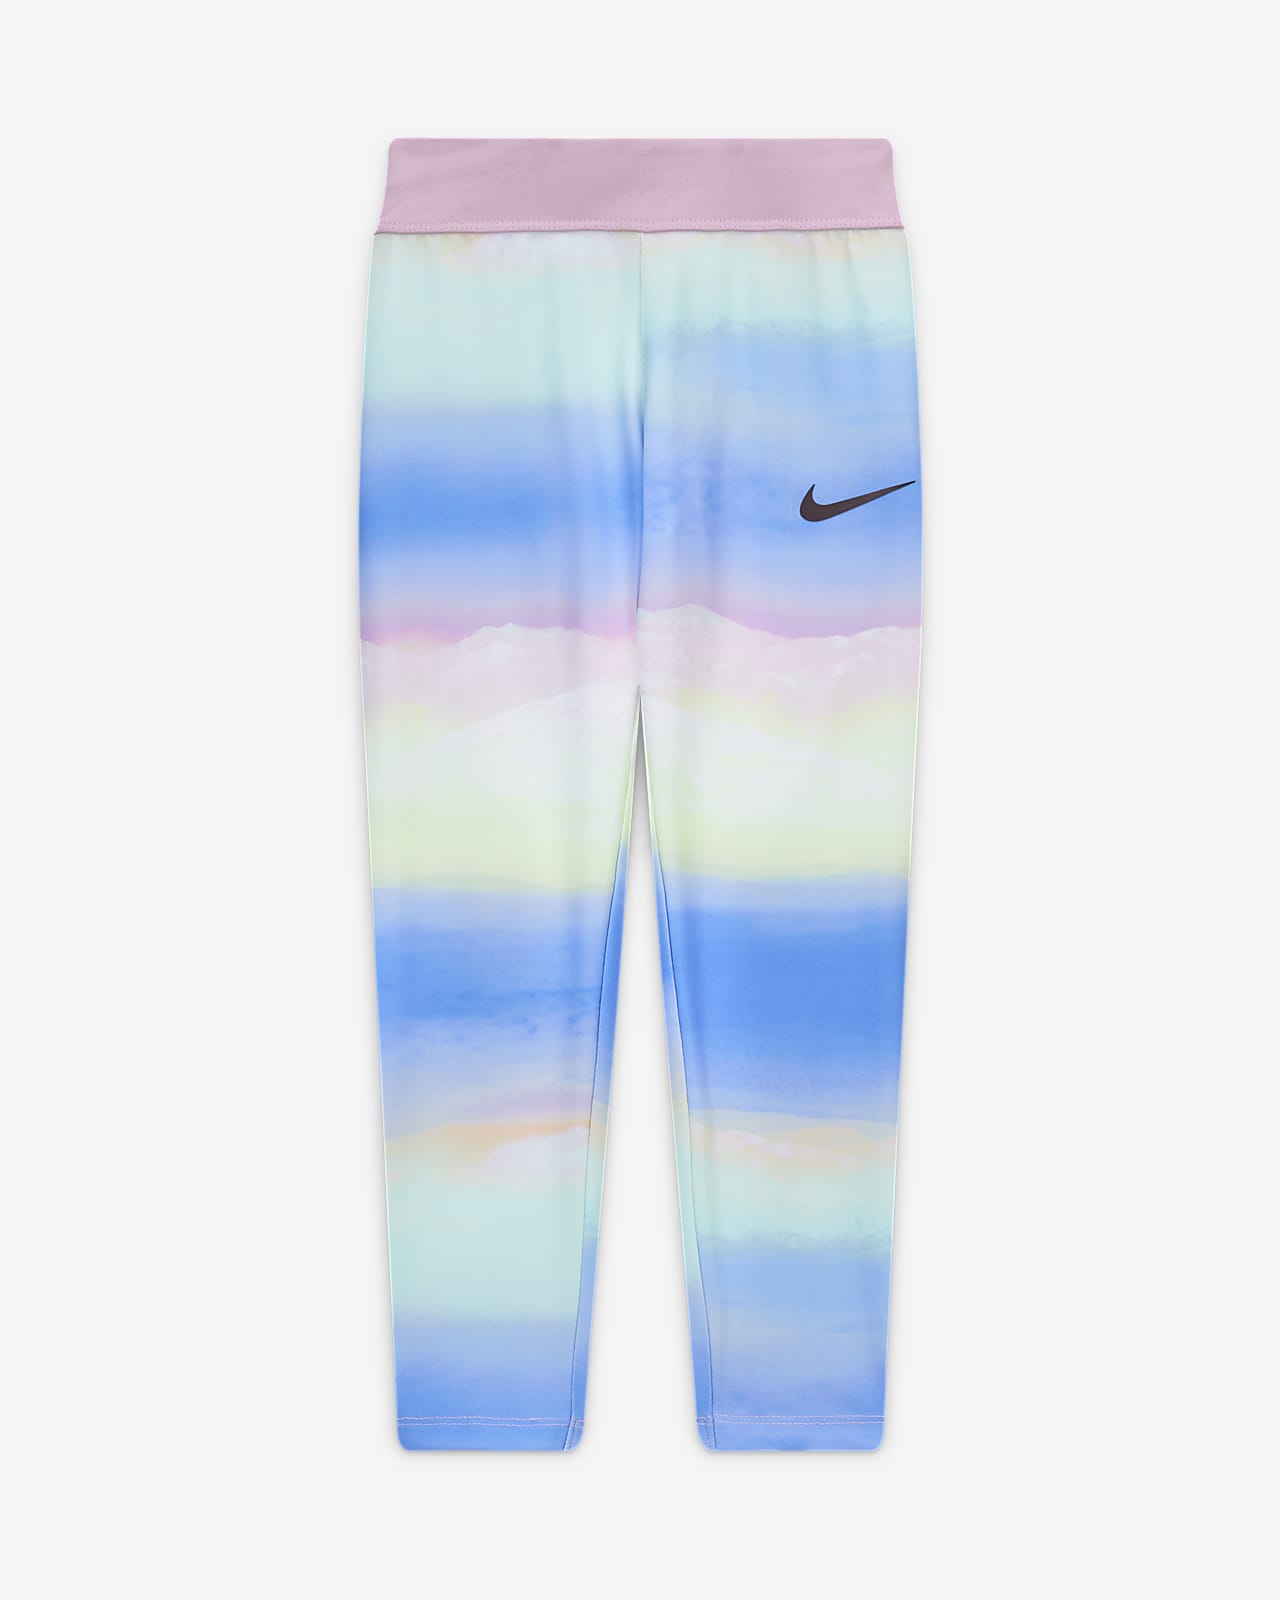 Nike Dri-FIT 幼童中长紧身裤